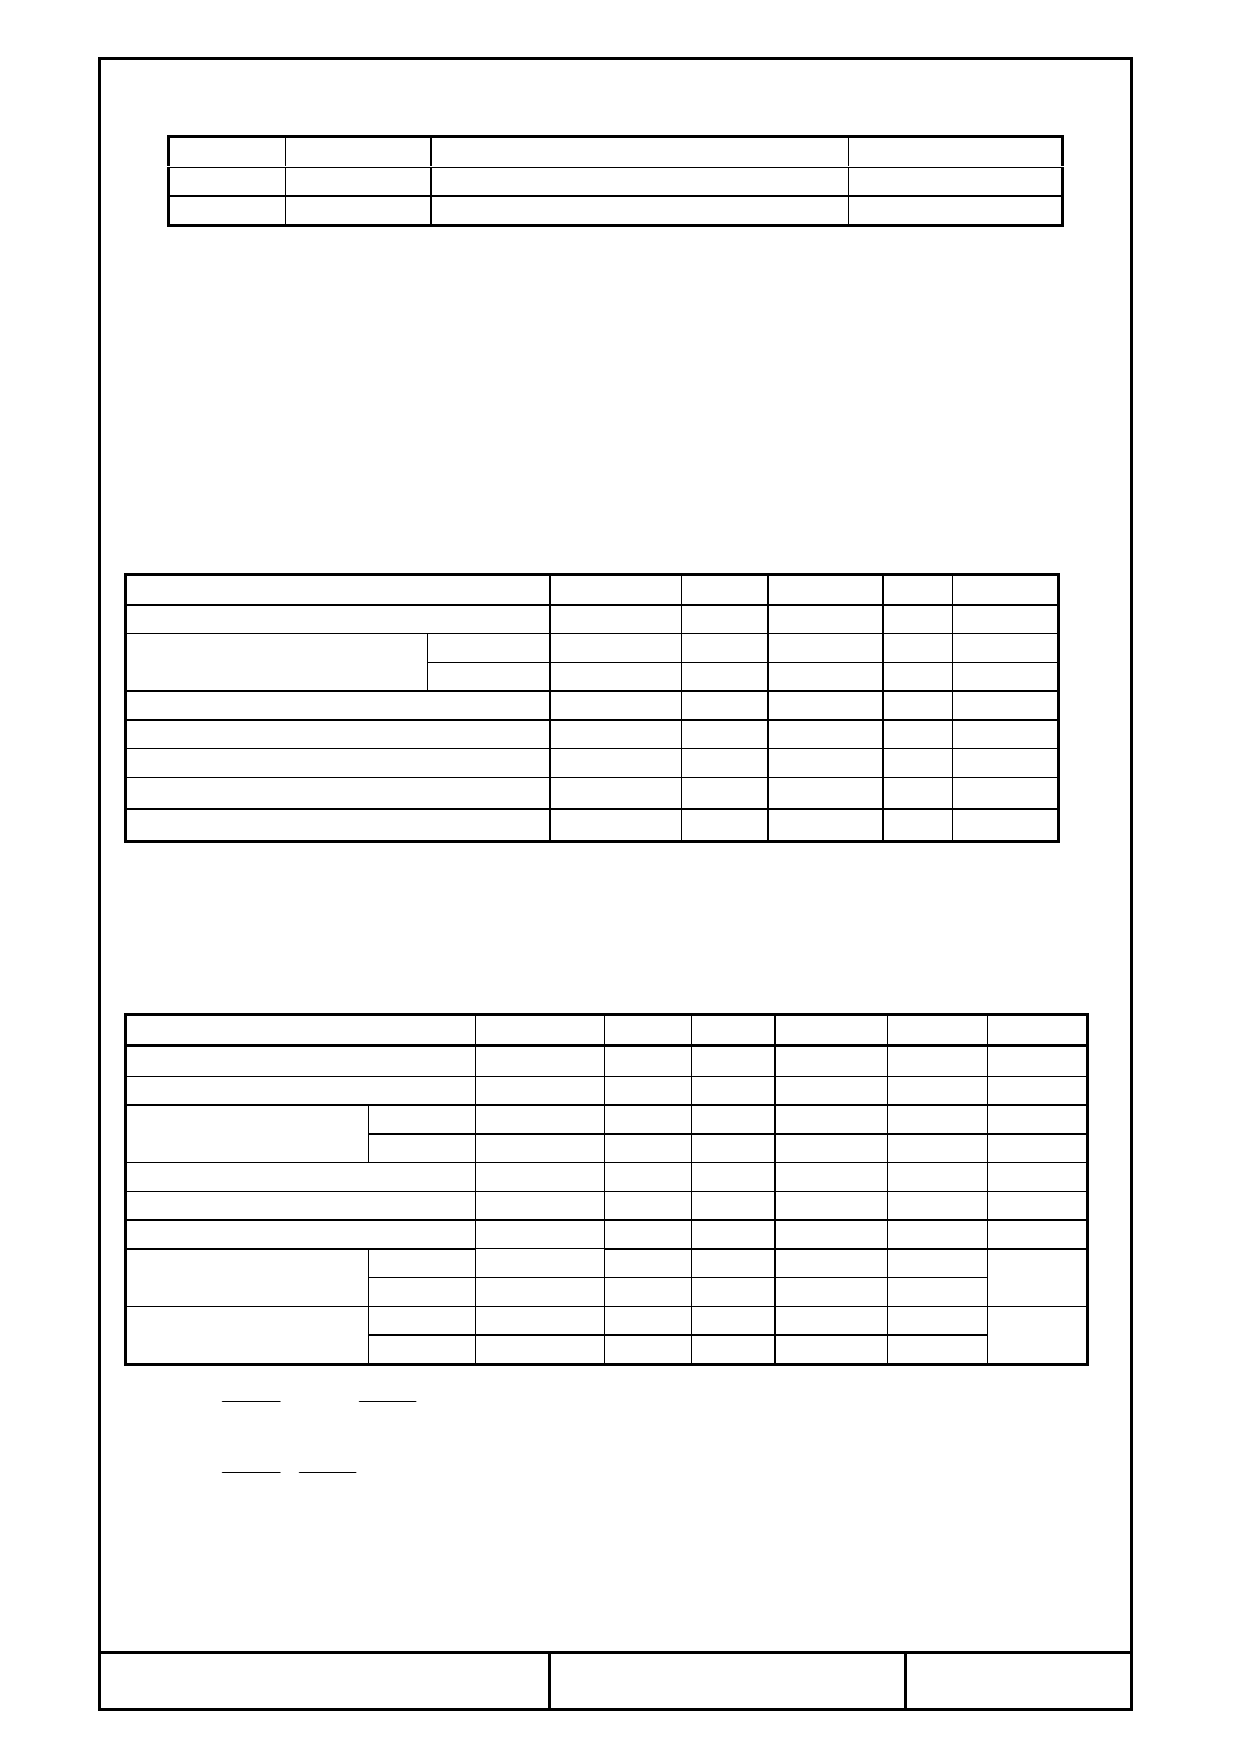 T-51381L064J_FW_P_AD pdf